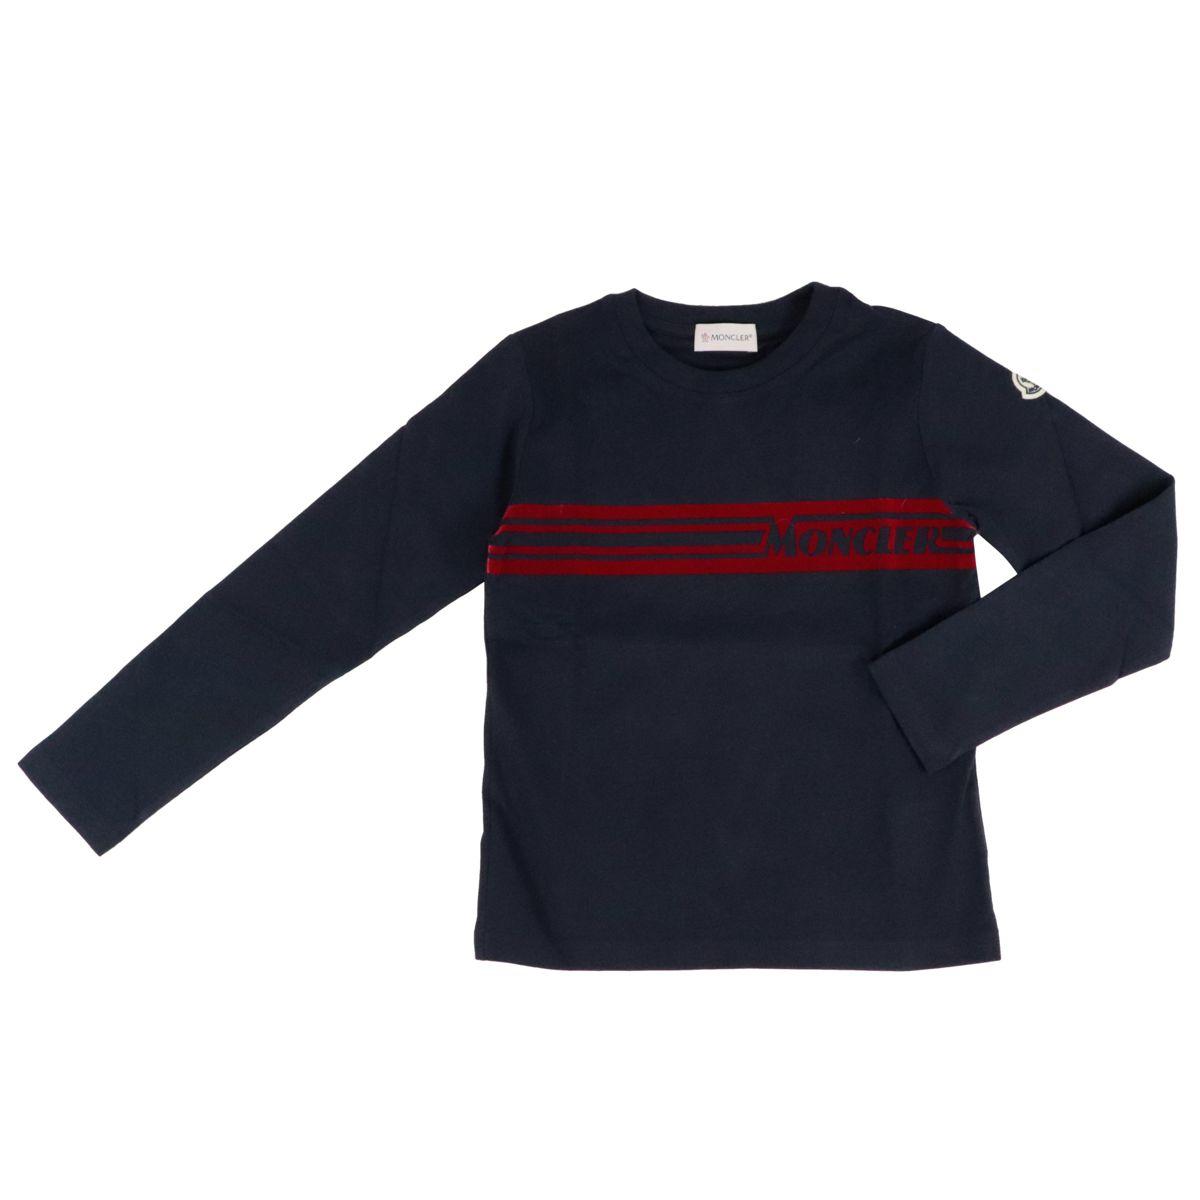 T-shirt manica lunga in cotone con stampa logo Blu Moncler